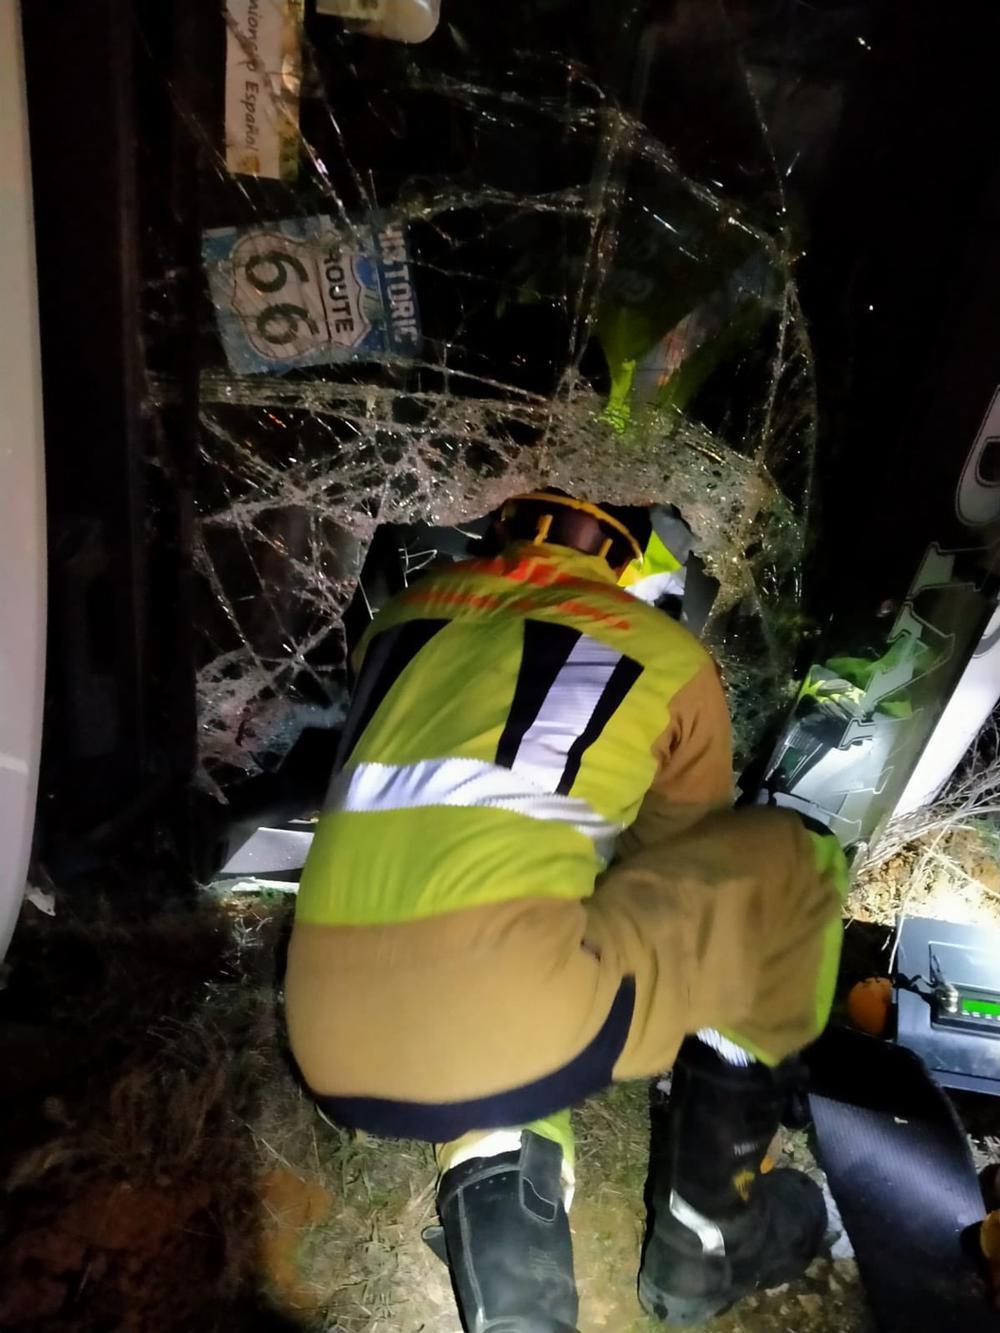 Fallece un camionero en la A-3 a la altura de Minglanilla